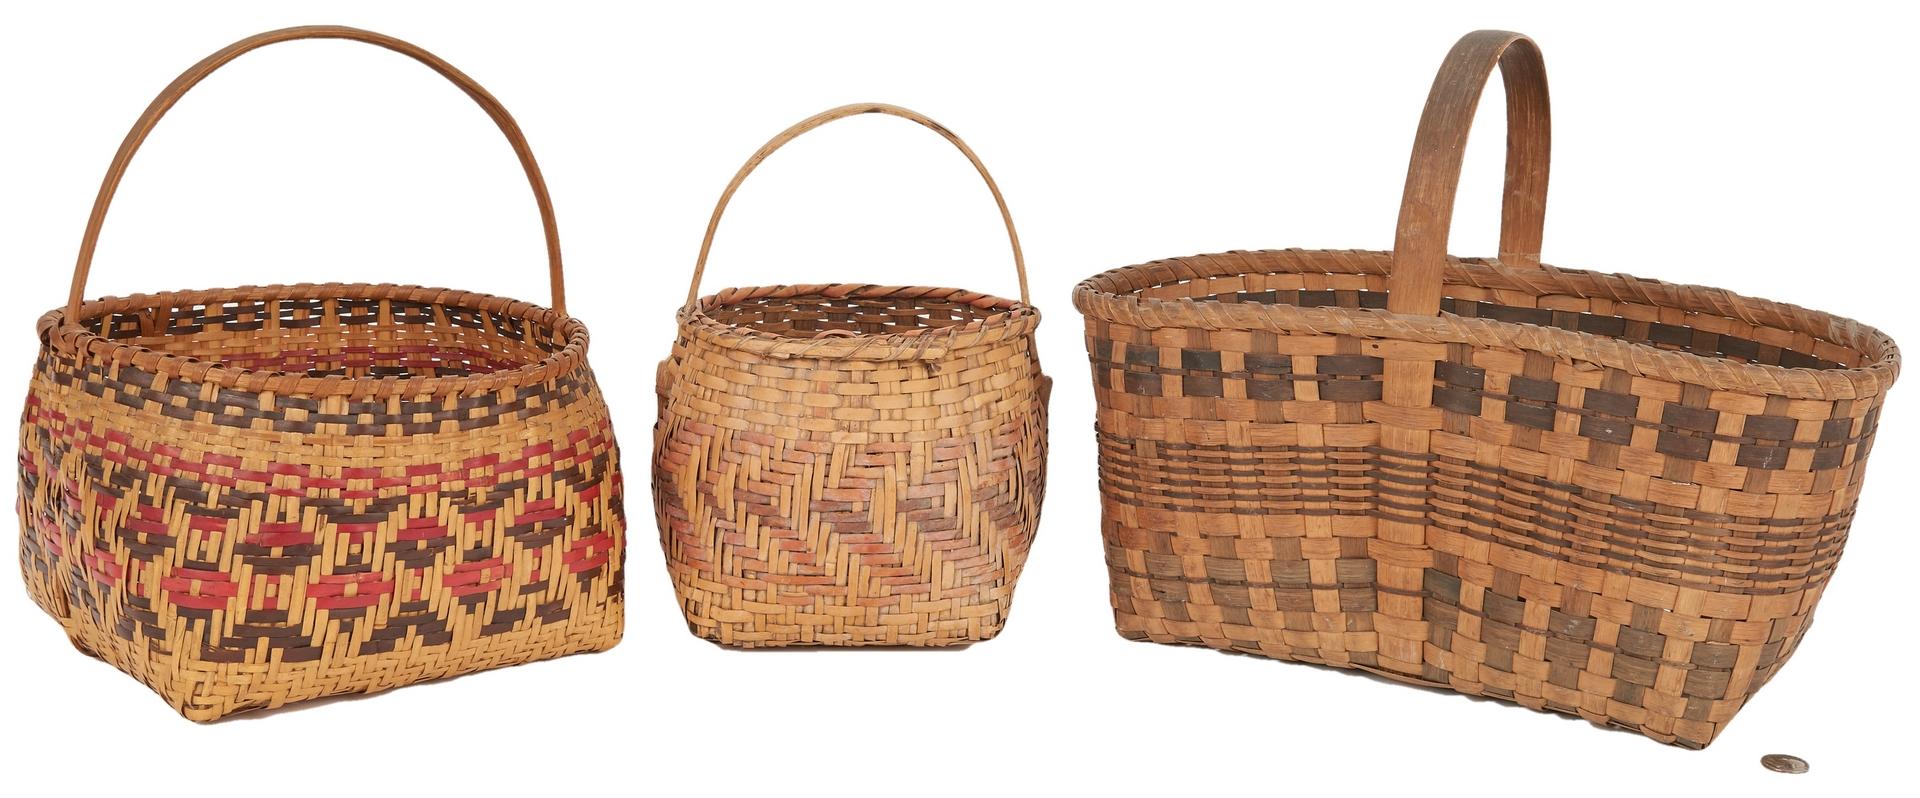 Lot 585: 3 Cherokee Indian Baskets, Two Rivercane